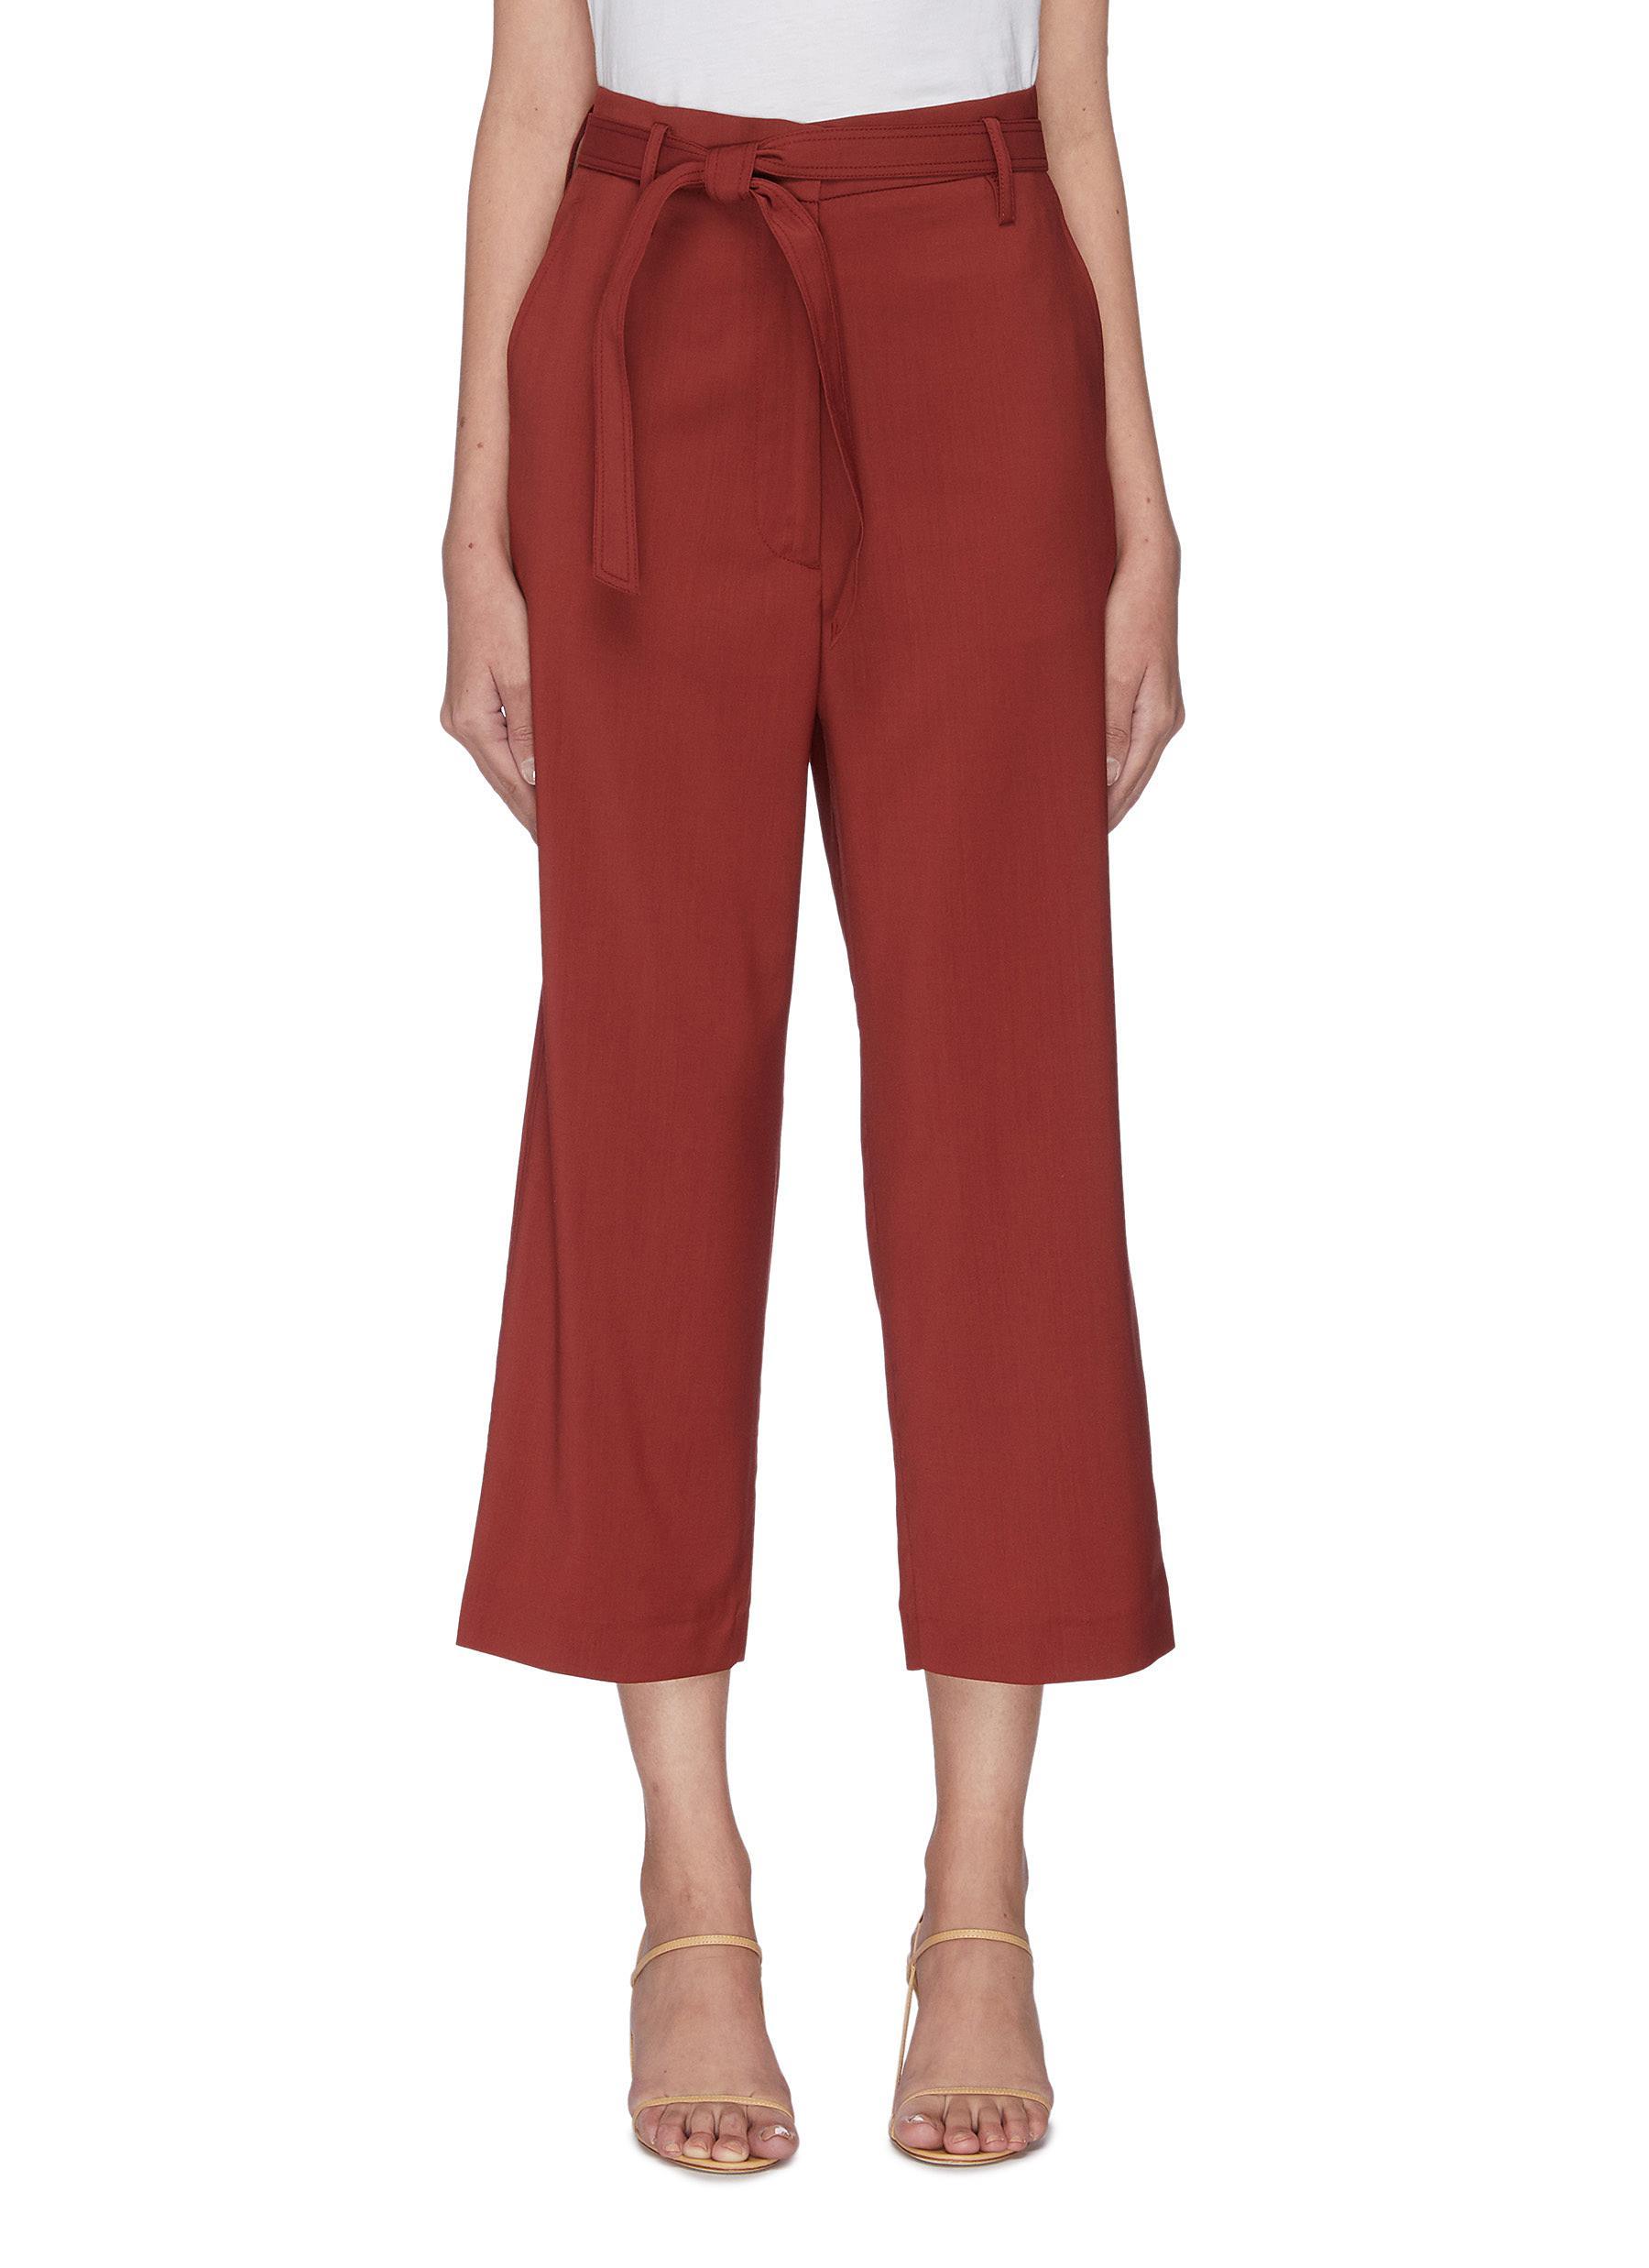 Buy Barena Pants & Shorts 'Giuditta' belted virgin wool crop pants